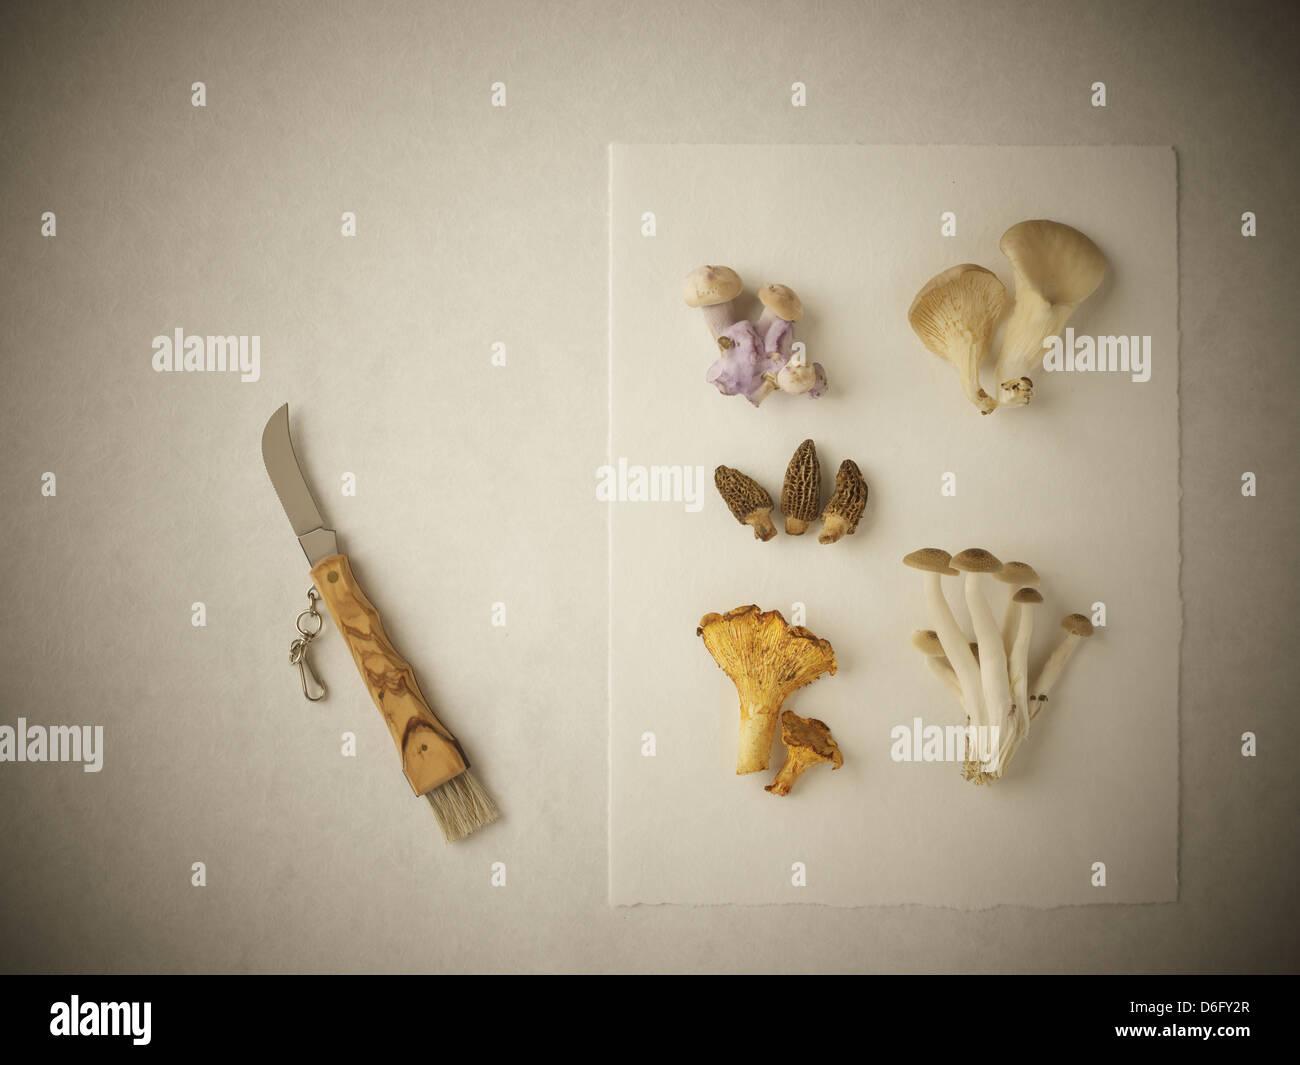 Mushrooms selection - Stock Image